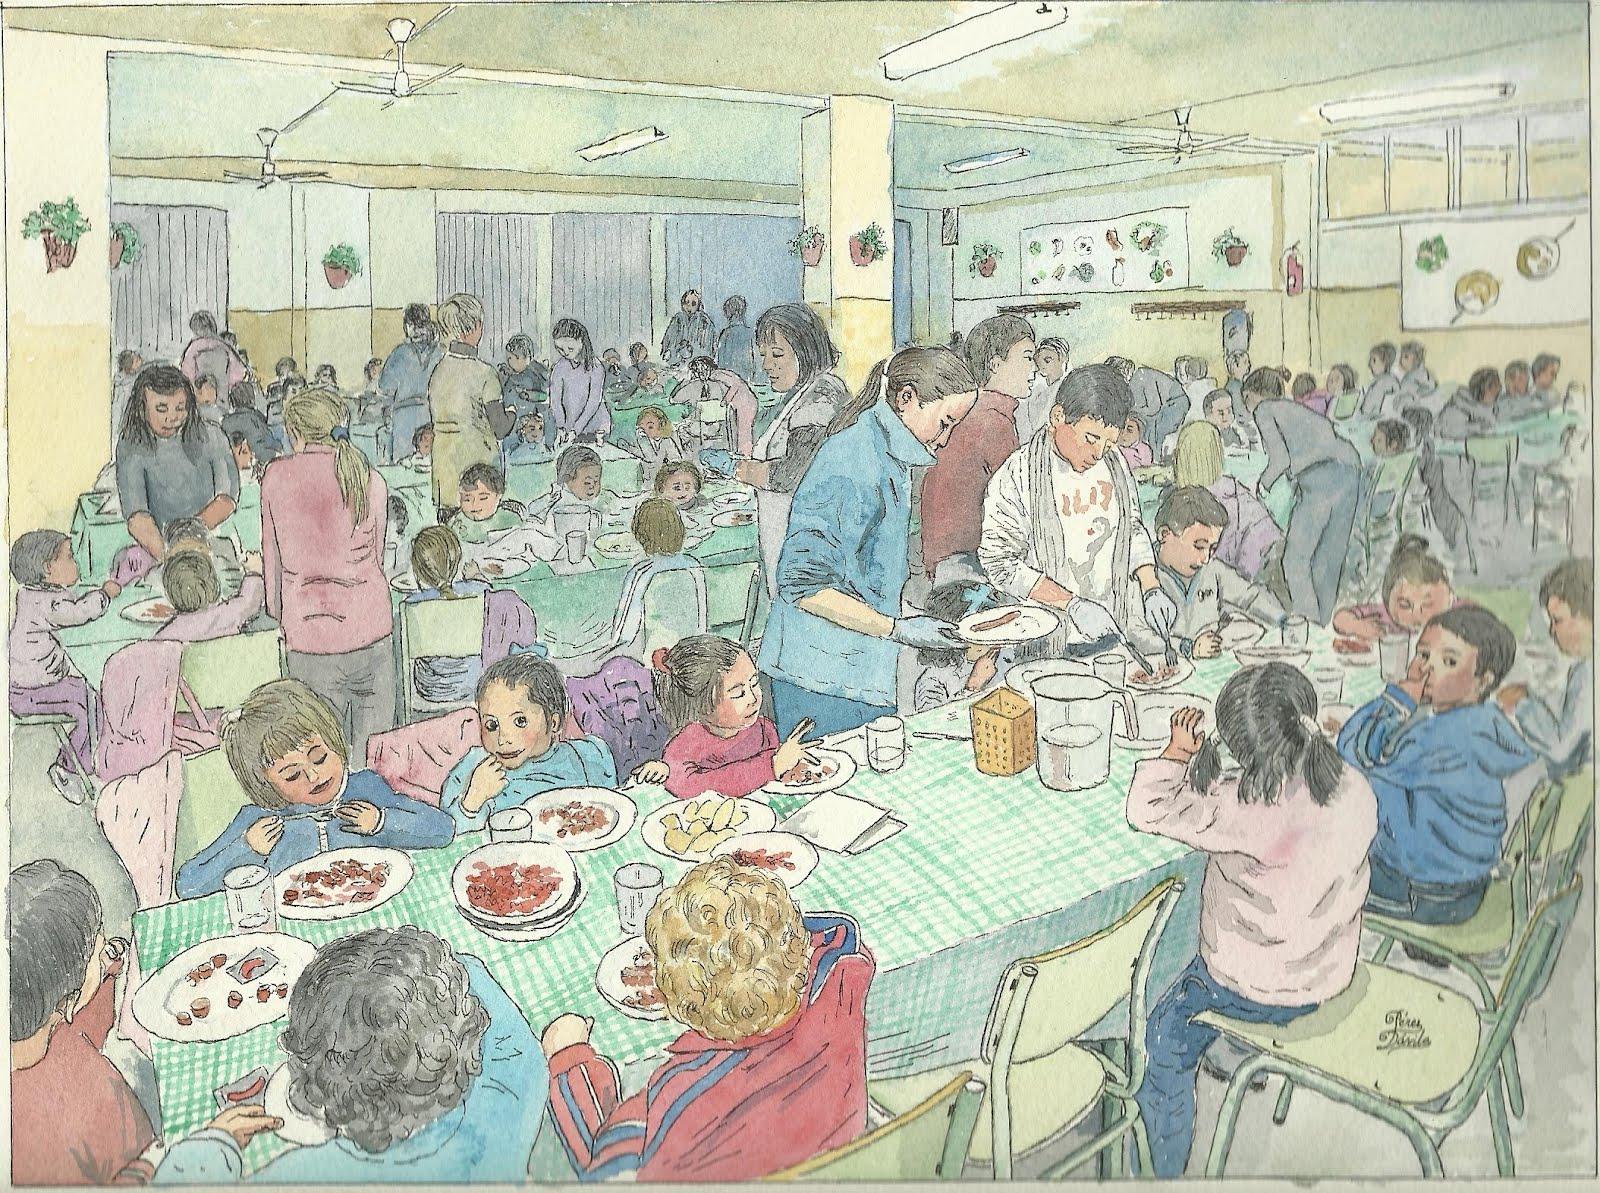 Dime que comes comedores escolares progresan for Normas para el comedor escolar